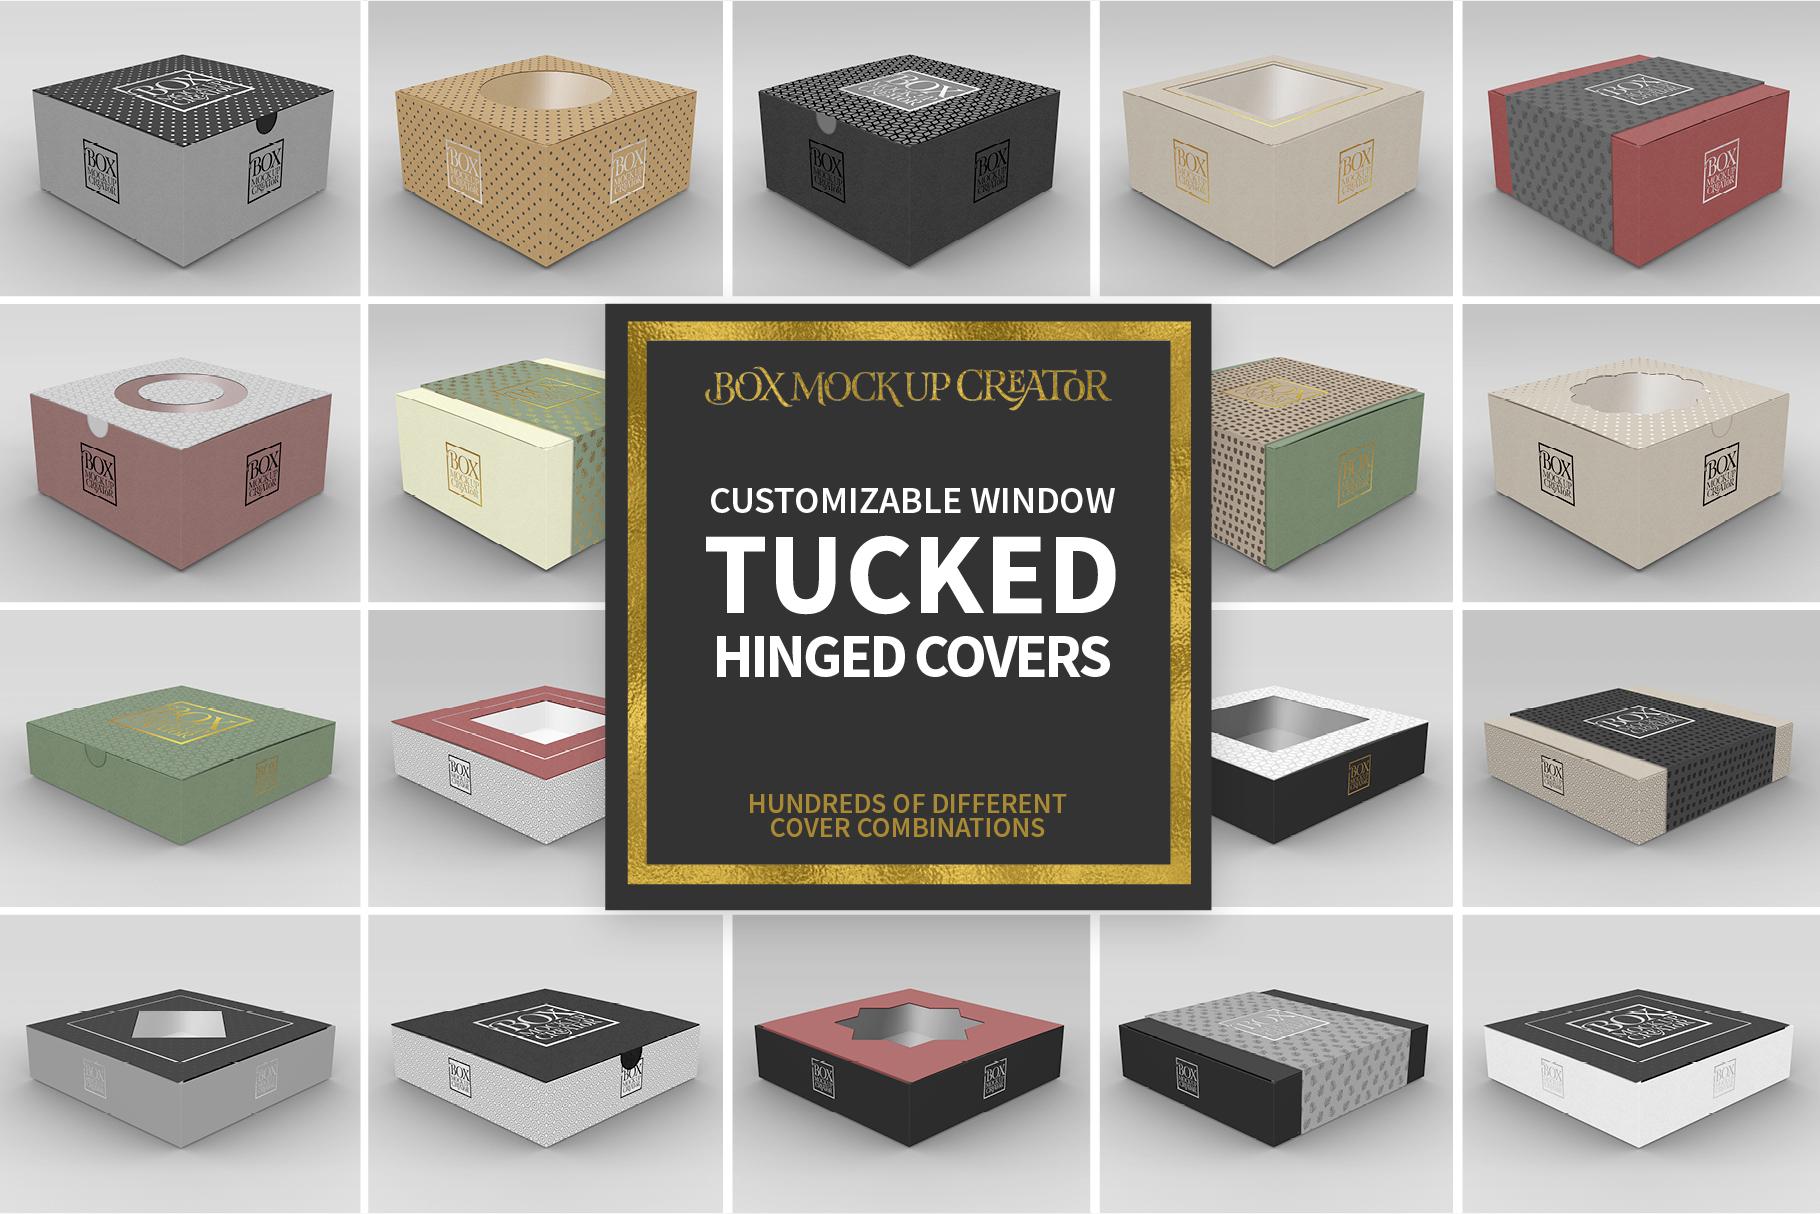 Square Box Packaging Mockup Creator example image 5